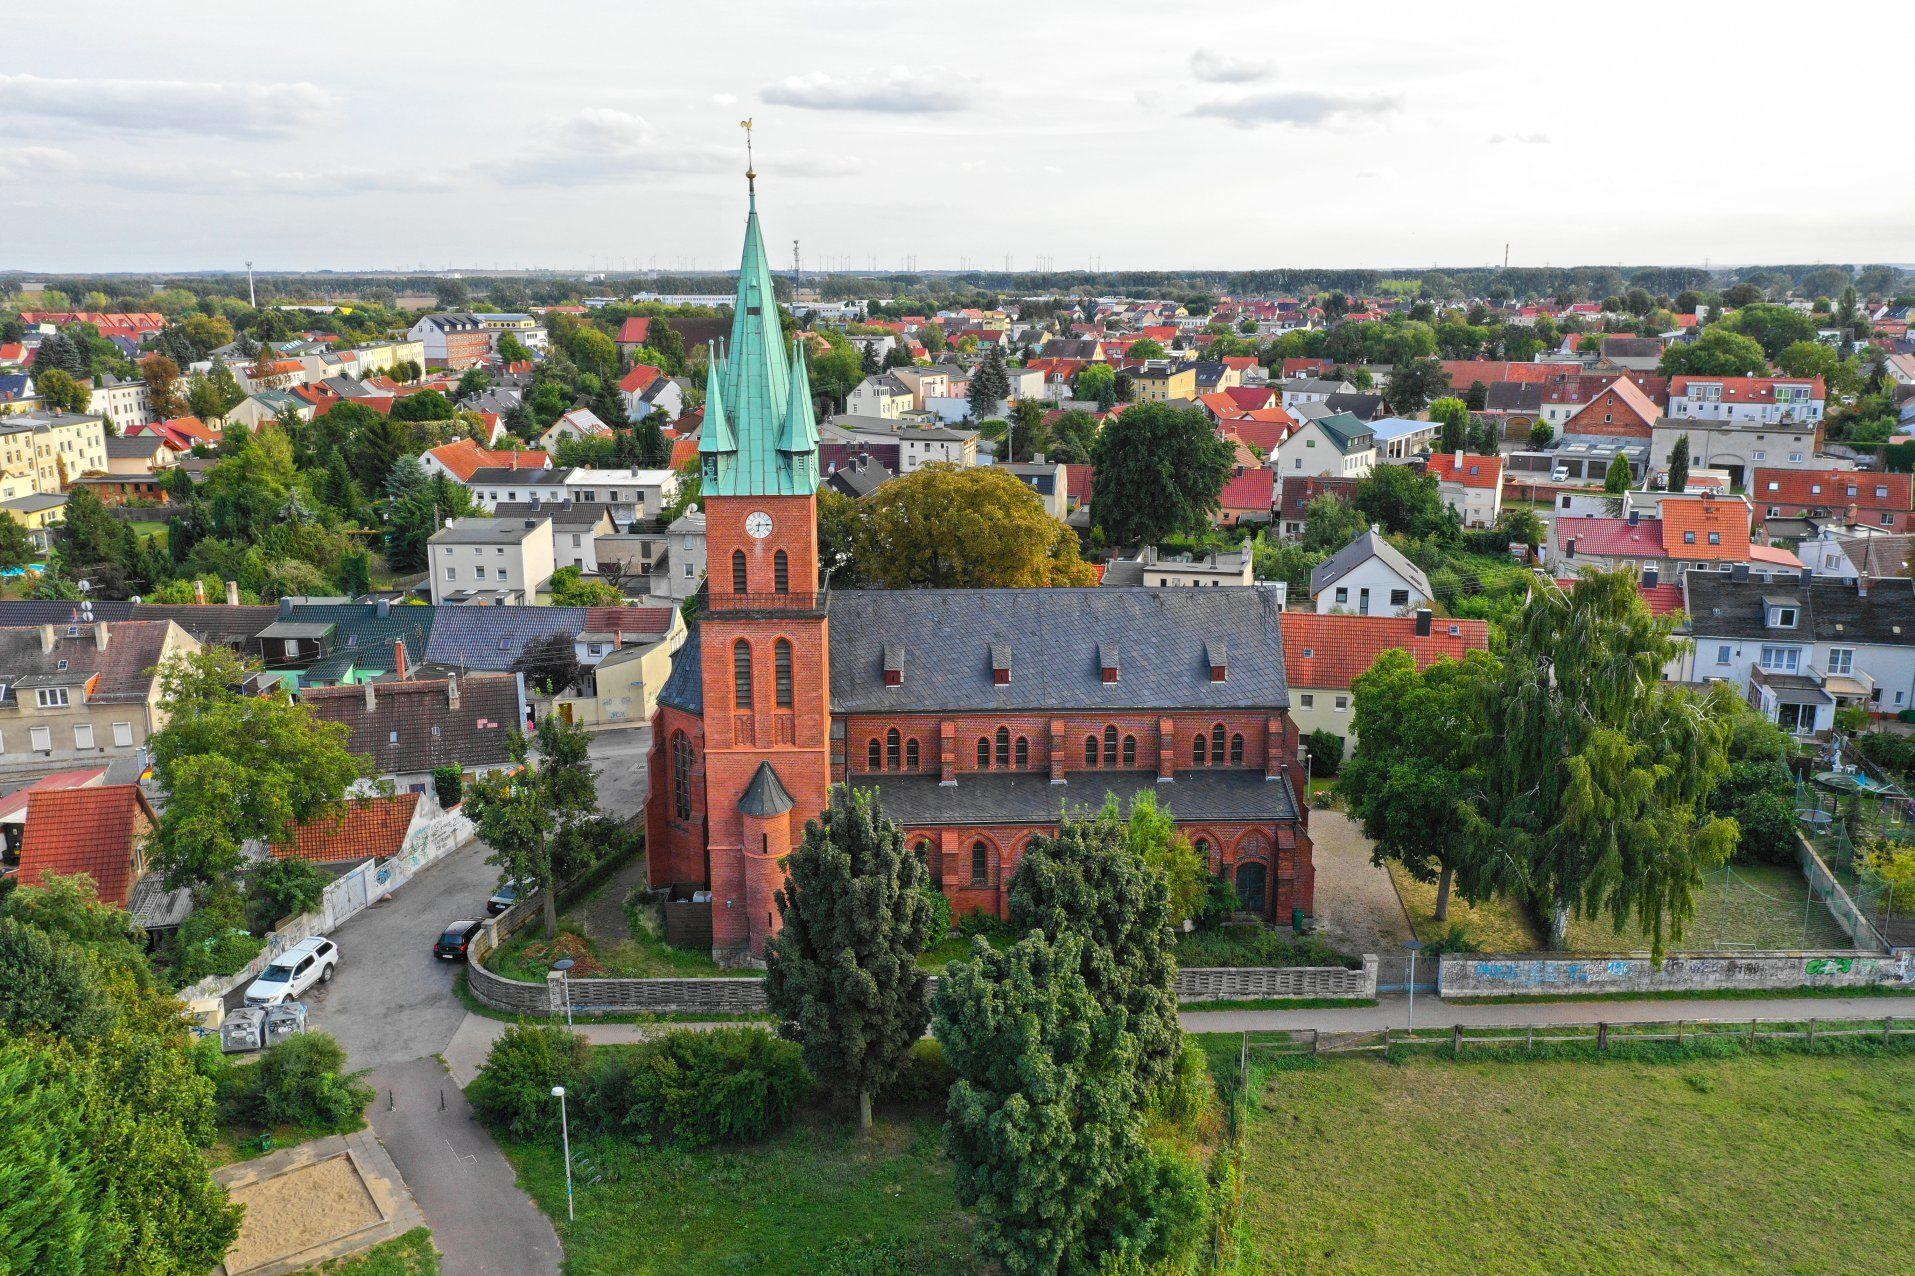 St.Maria-Hilf Kirche in Magdeburg Ottersleben